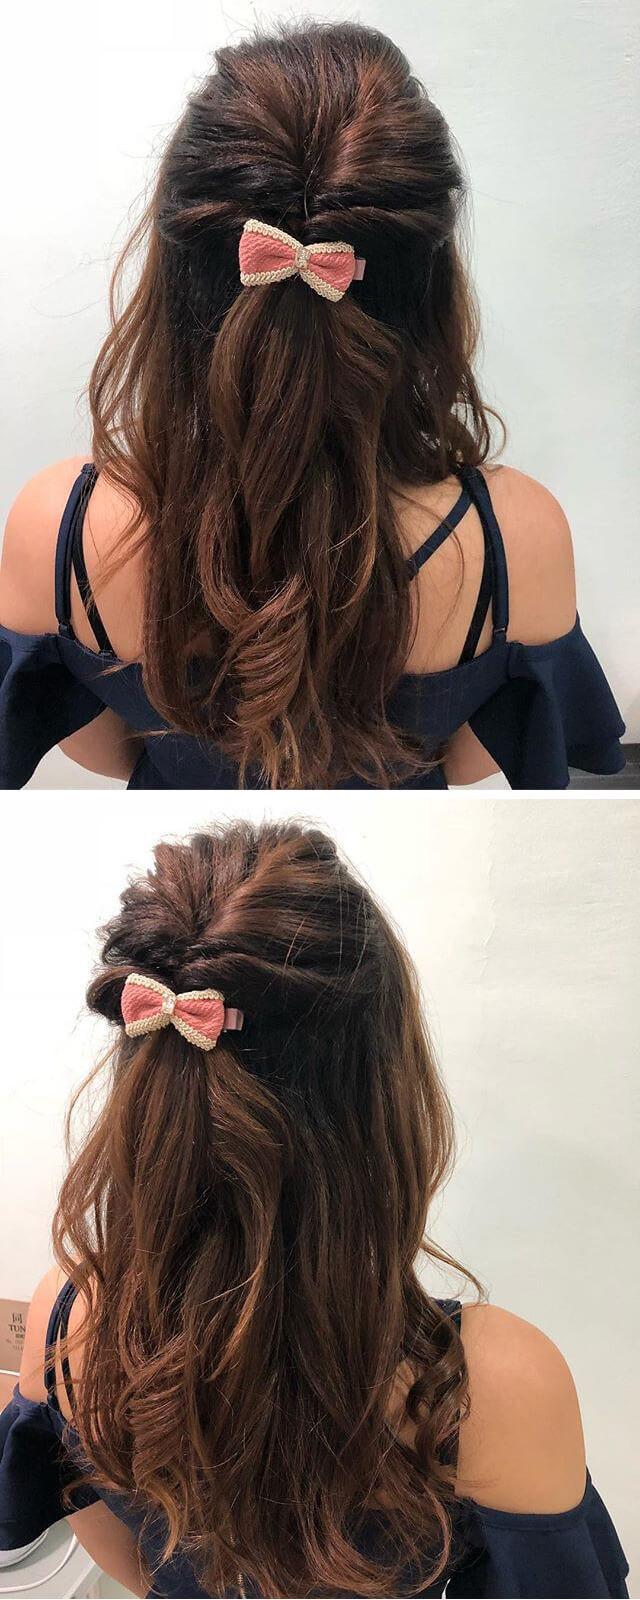 Easy Everyday Hairstyles for Medium Hair on Sensod - Sensod